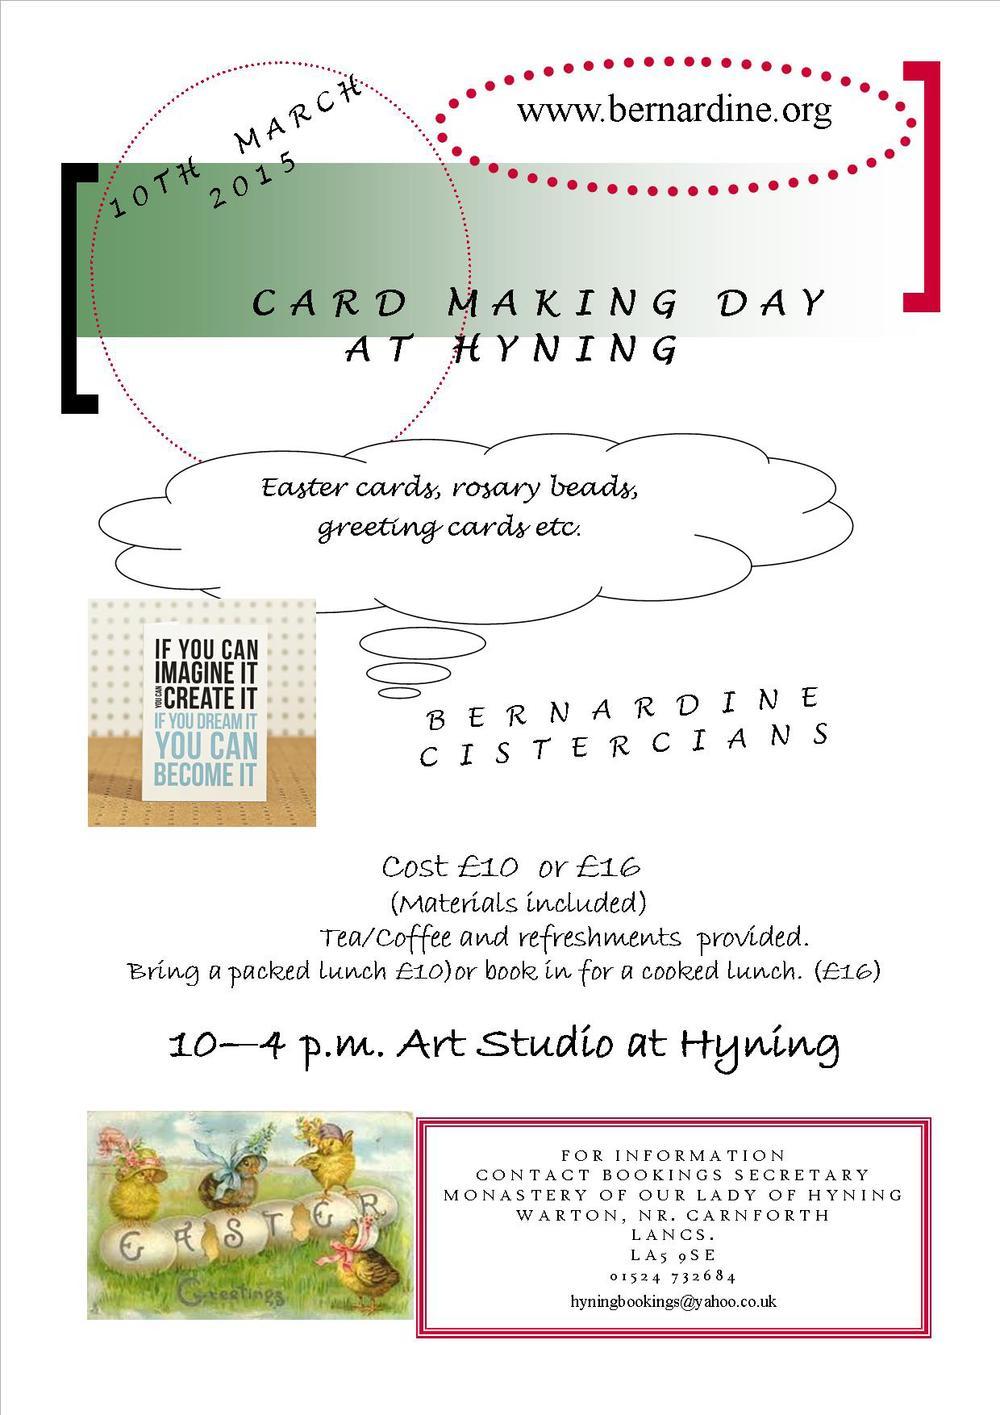 cardmakingday